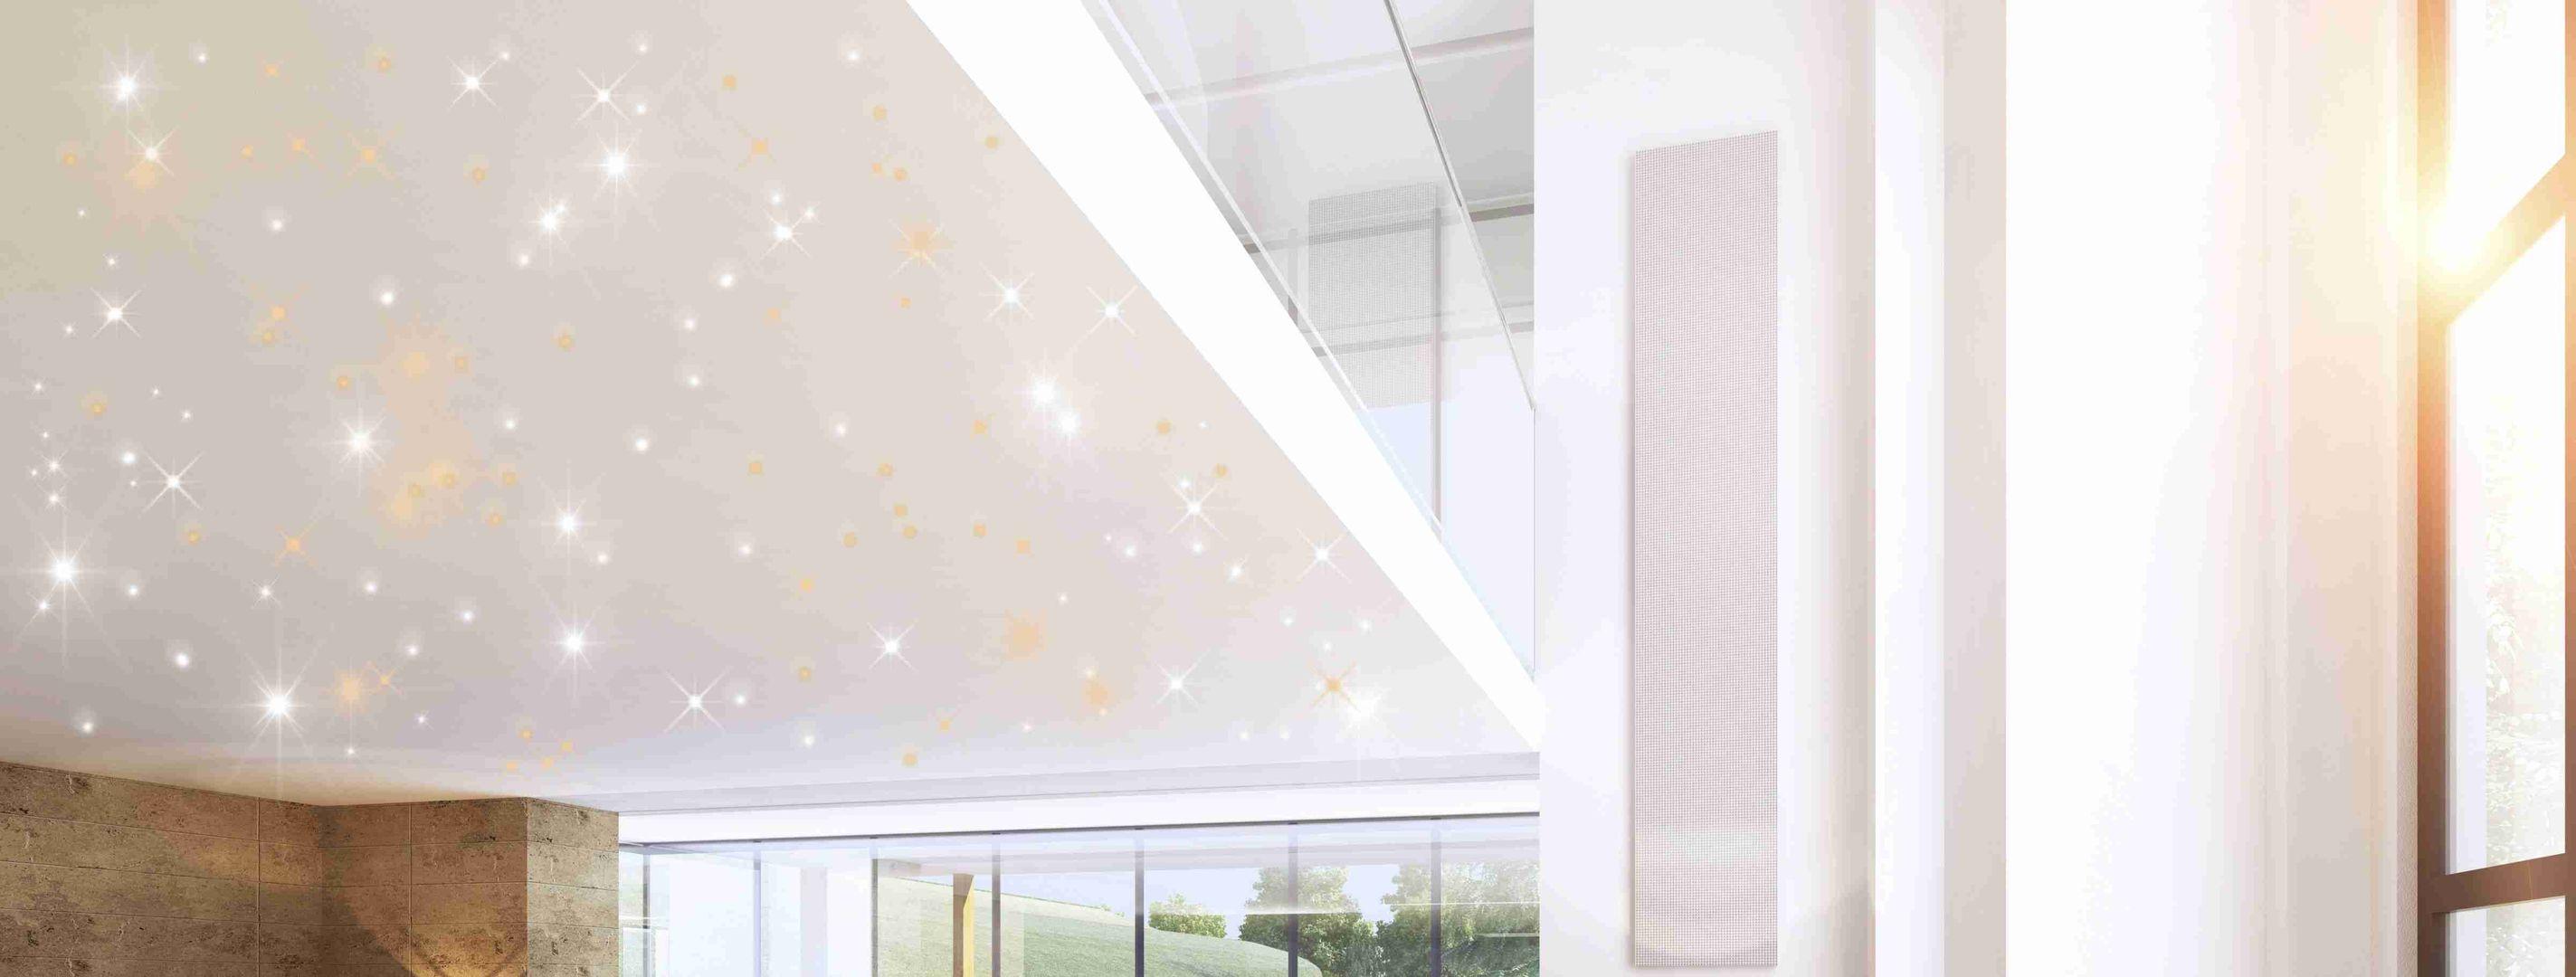 Alle PIXLUM LED Sternenhimmel Montagevideos